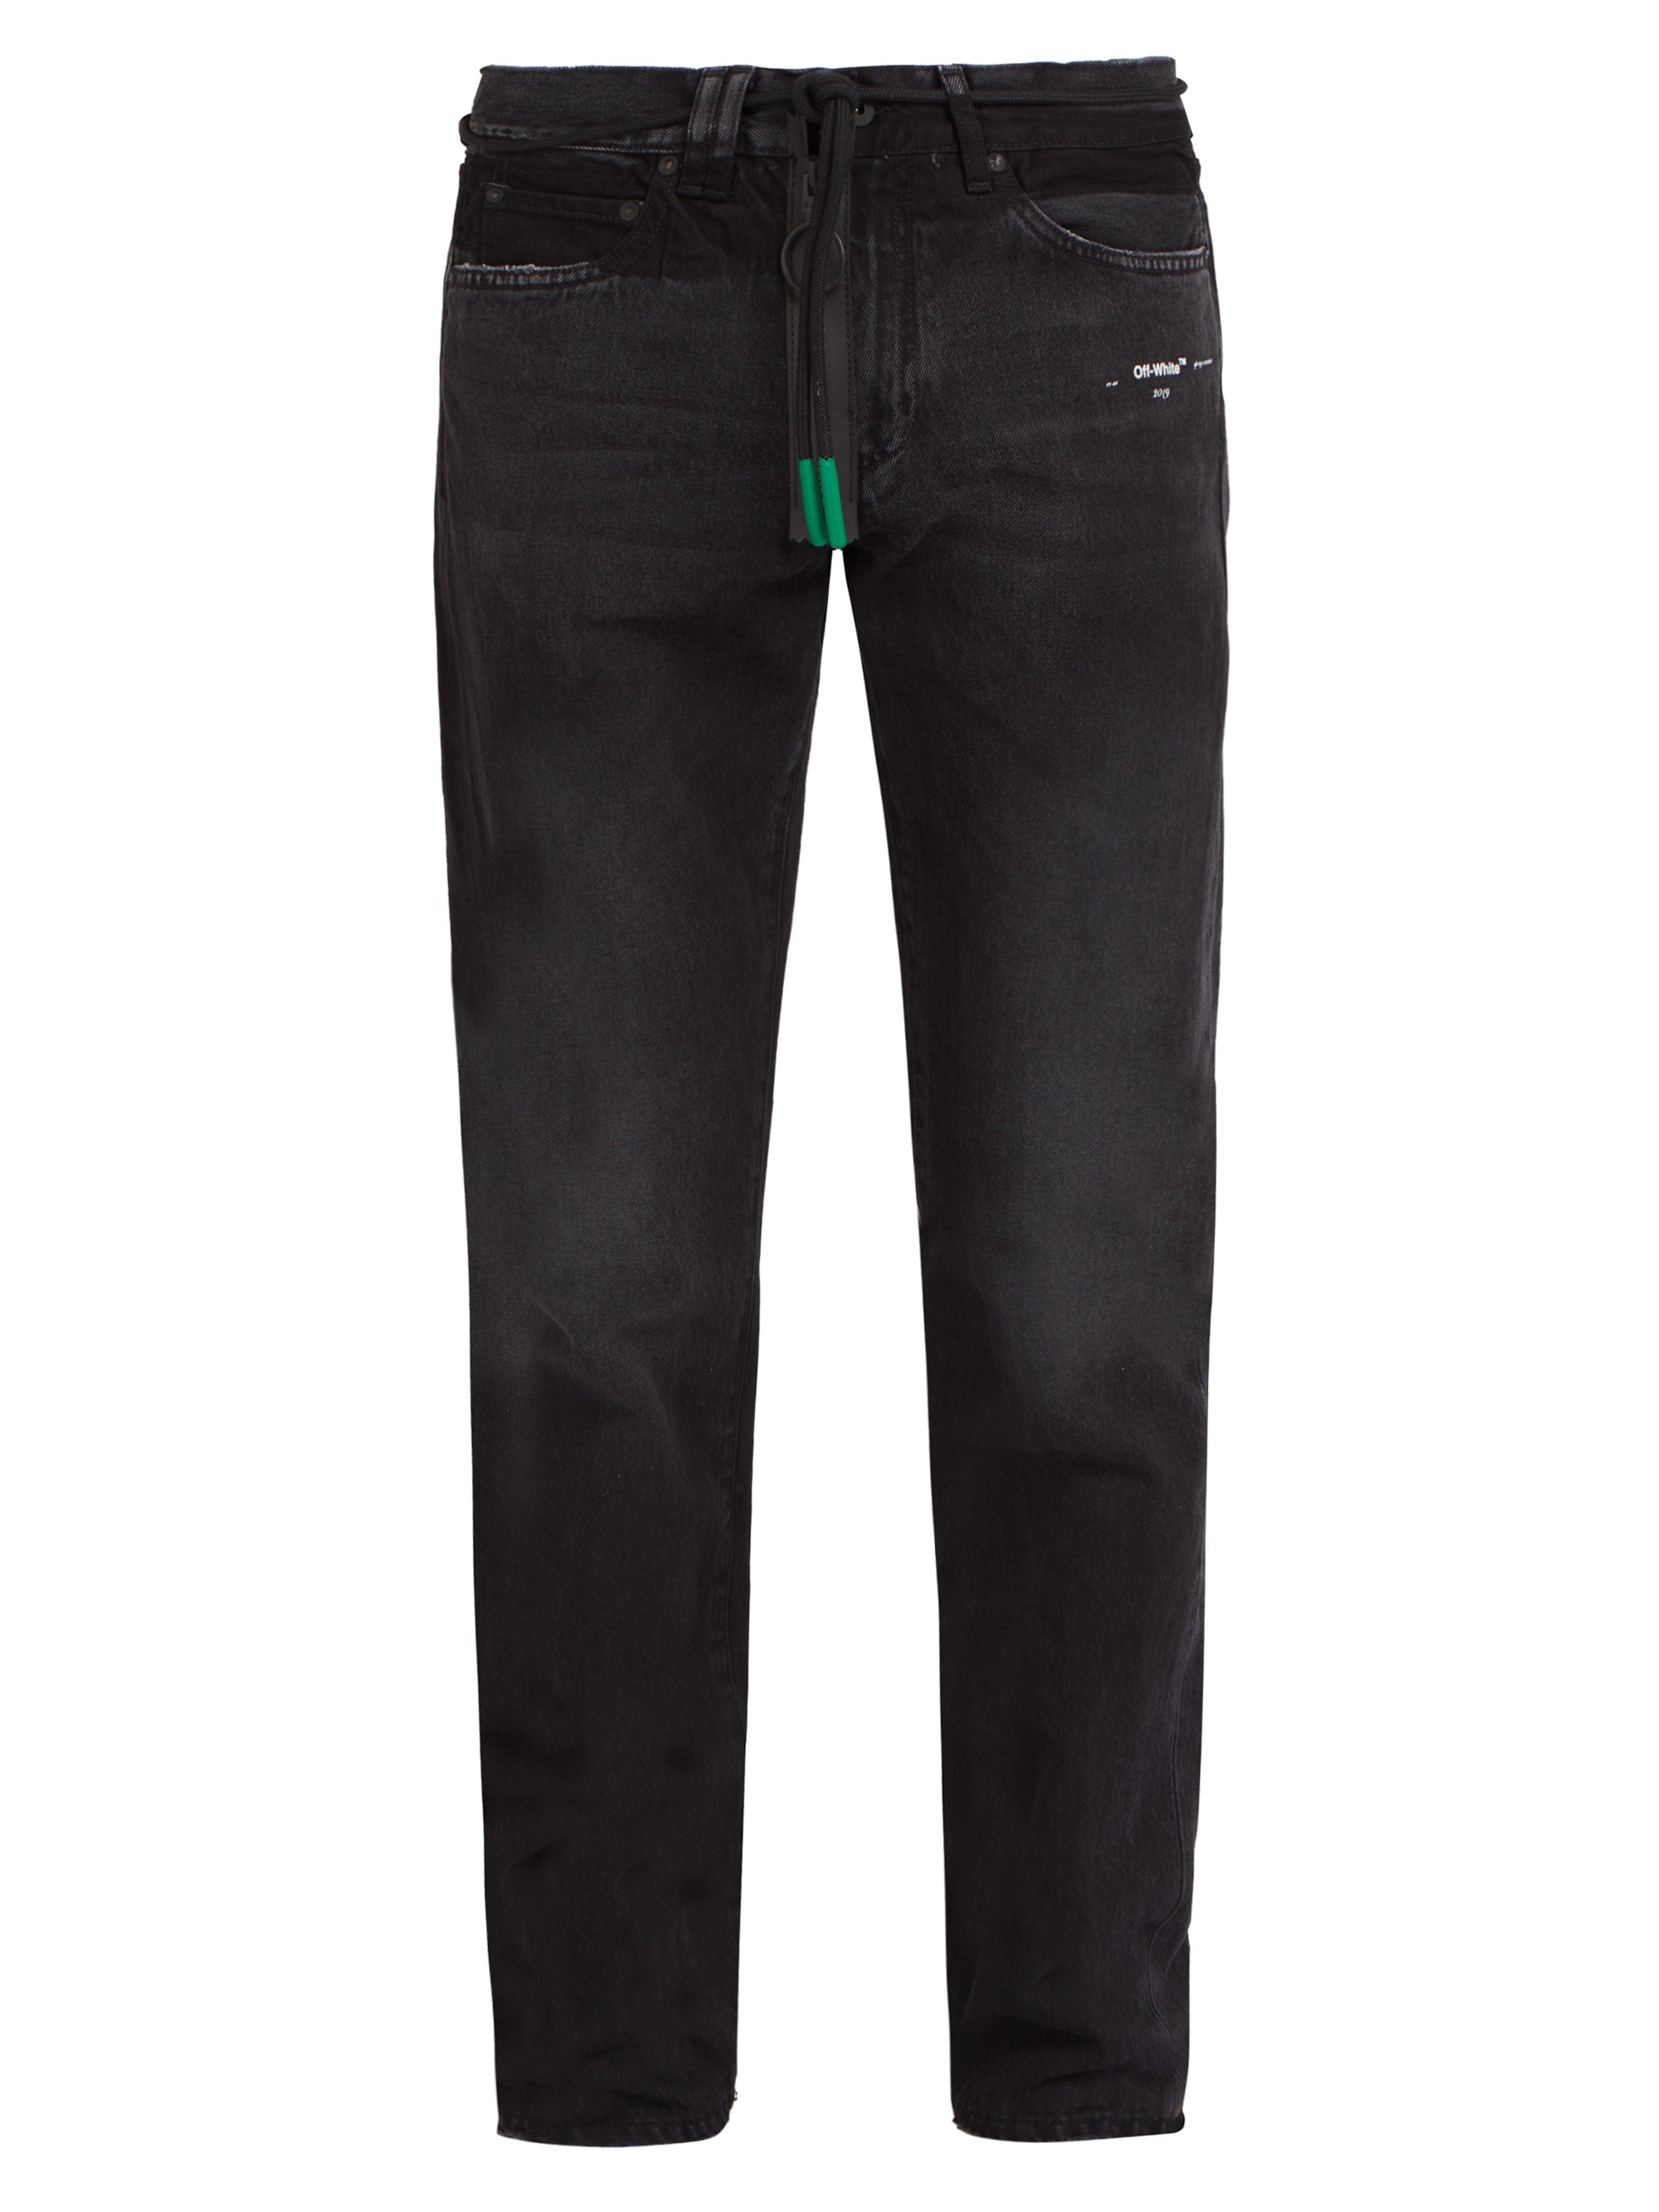 bf4c8b13f3f6 Off-White c o Virgil Abloh Logo Print Jeans in Black for Men - Lyst